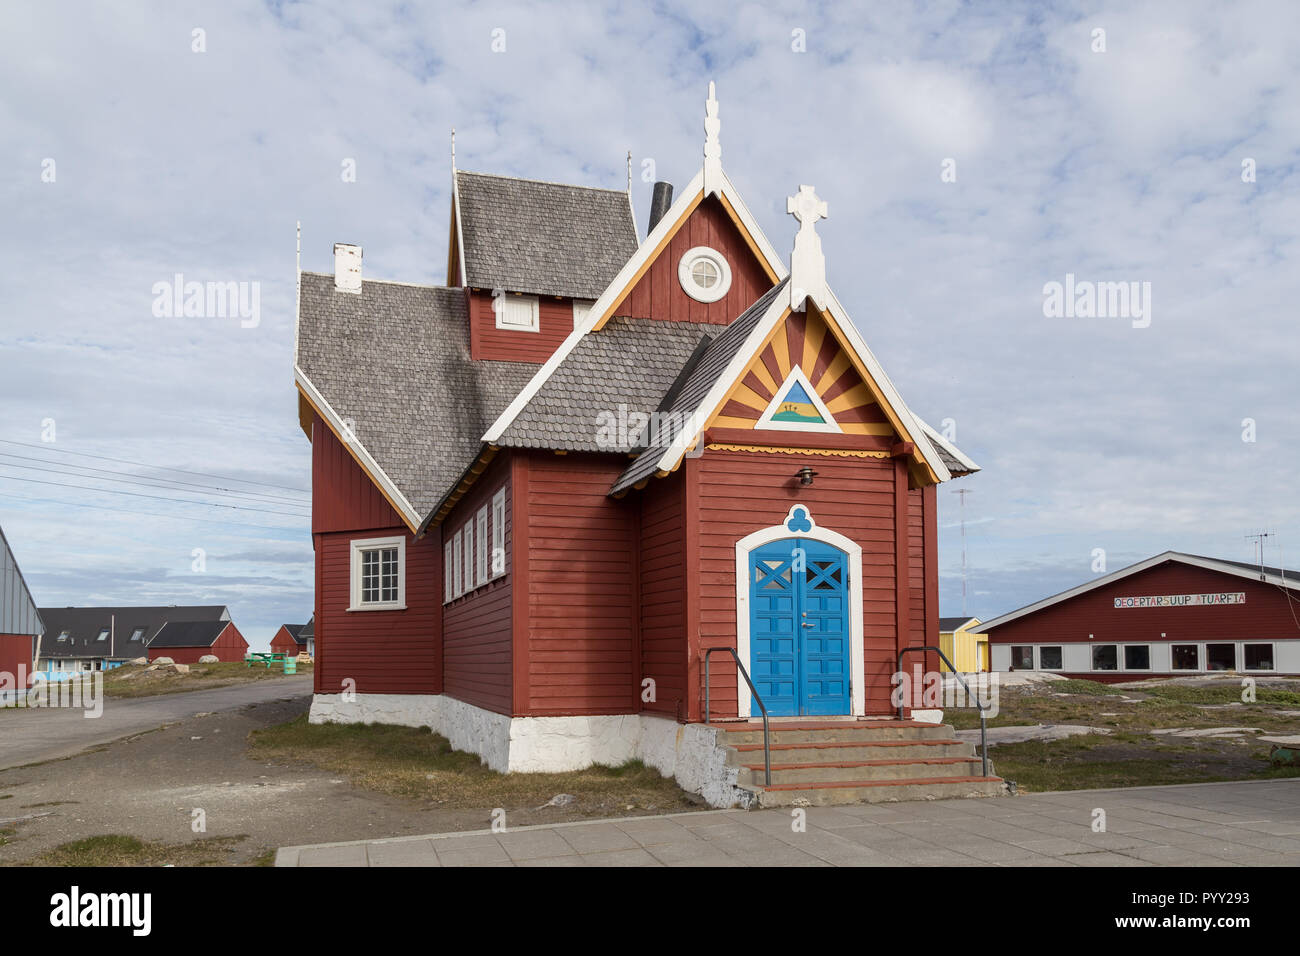 Church in Qeqertarsuaq, Greenland - Stock Image